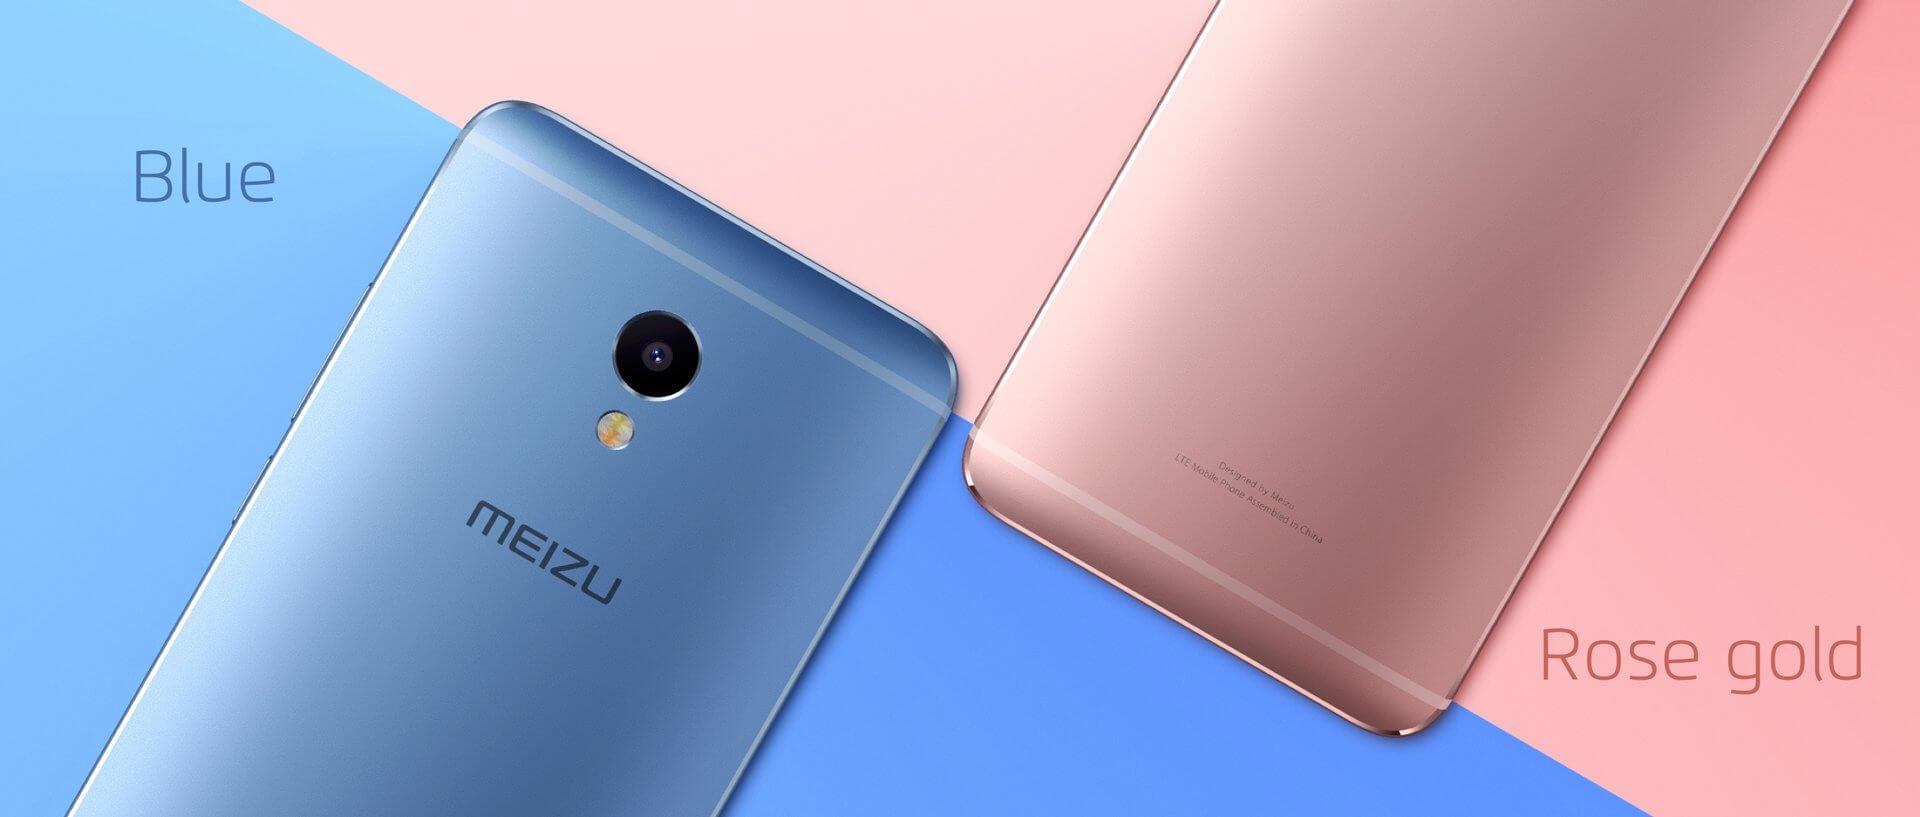 Meizu M3e ufficiale